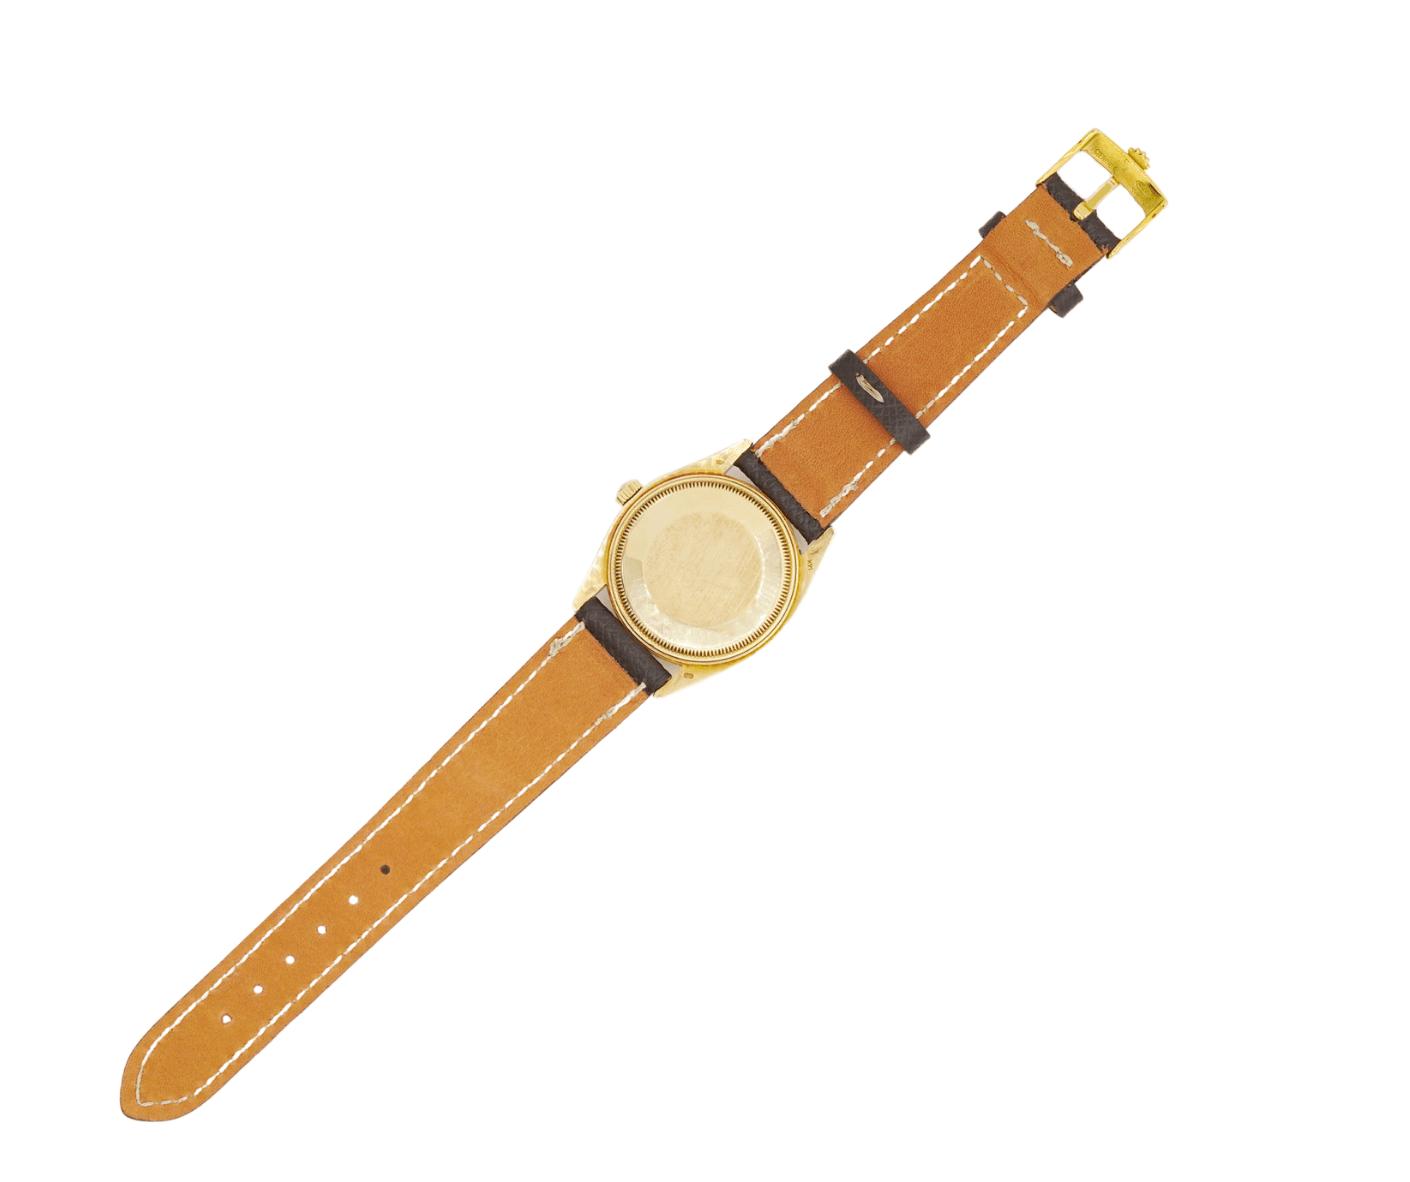 Men's Vintage Rolex Oyster Date 1503 14kt Yellow Gold Case & 14kt Yellow Gold Fluted Bezel Wrist Watch